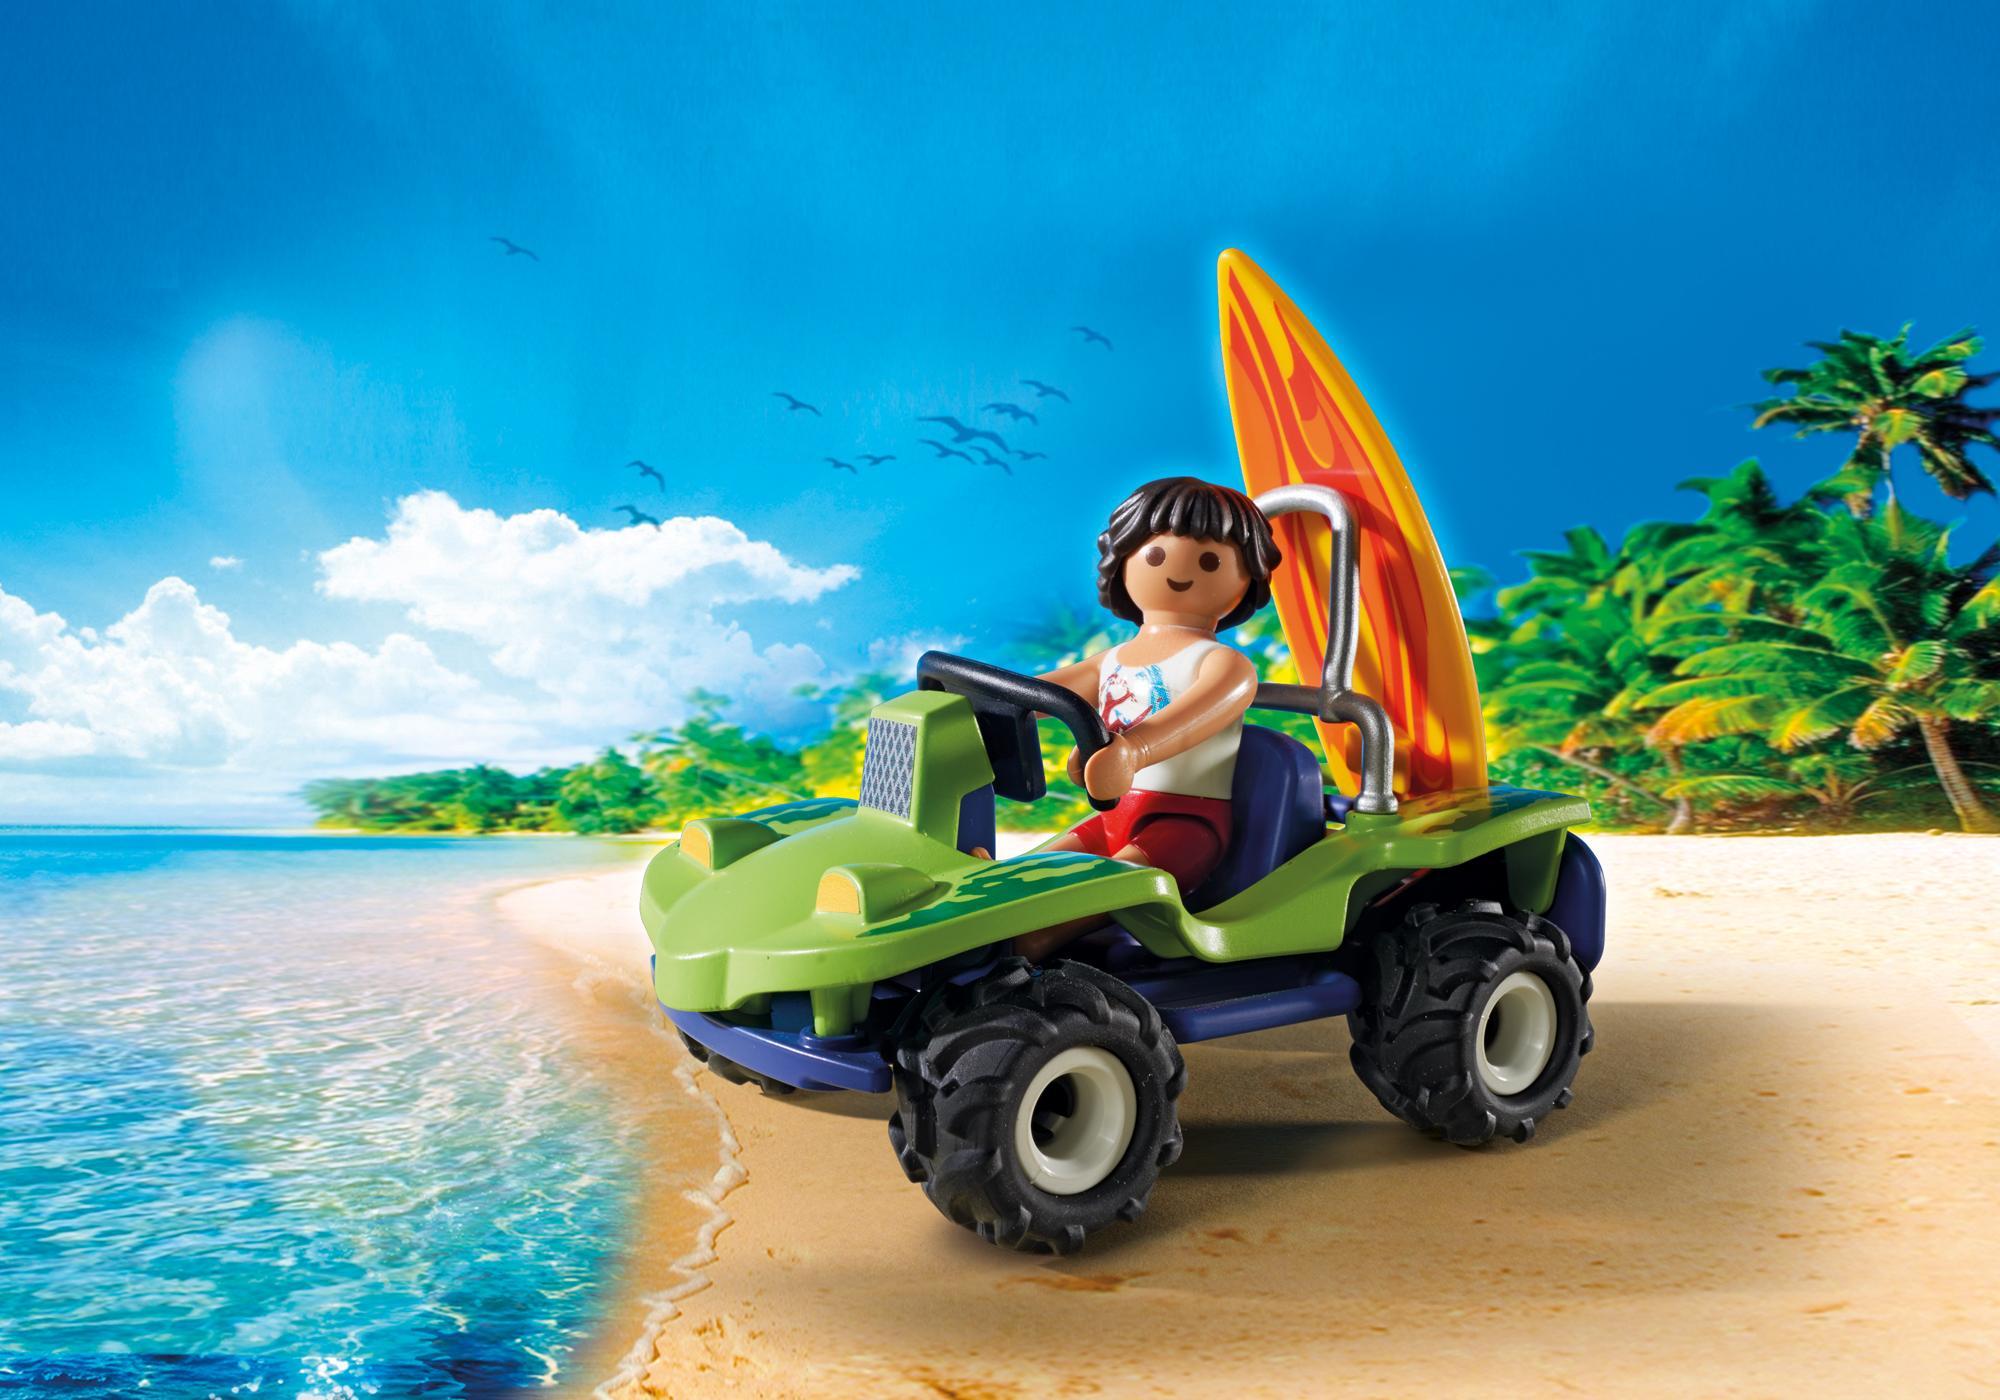 http://media.playmobil.com/i/playmobil/6982_product_extra1